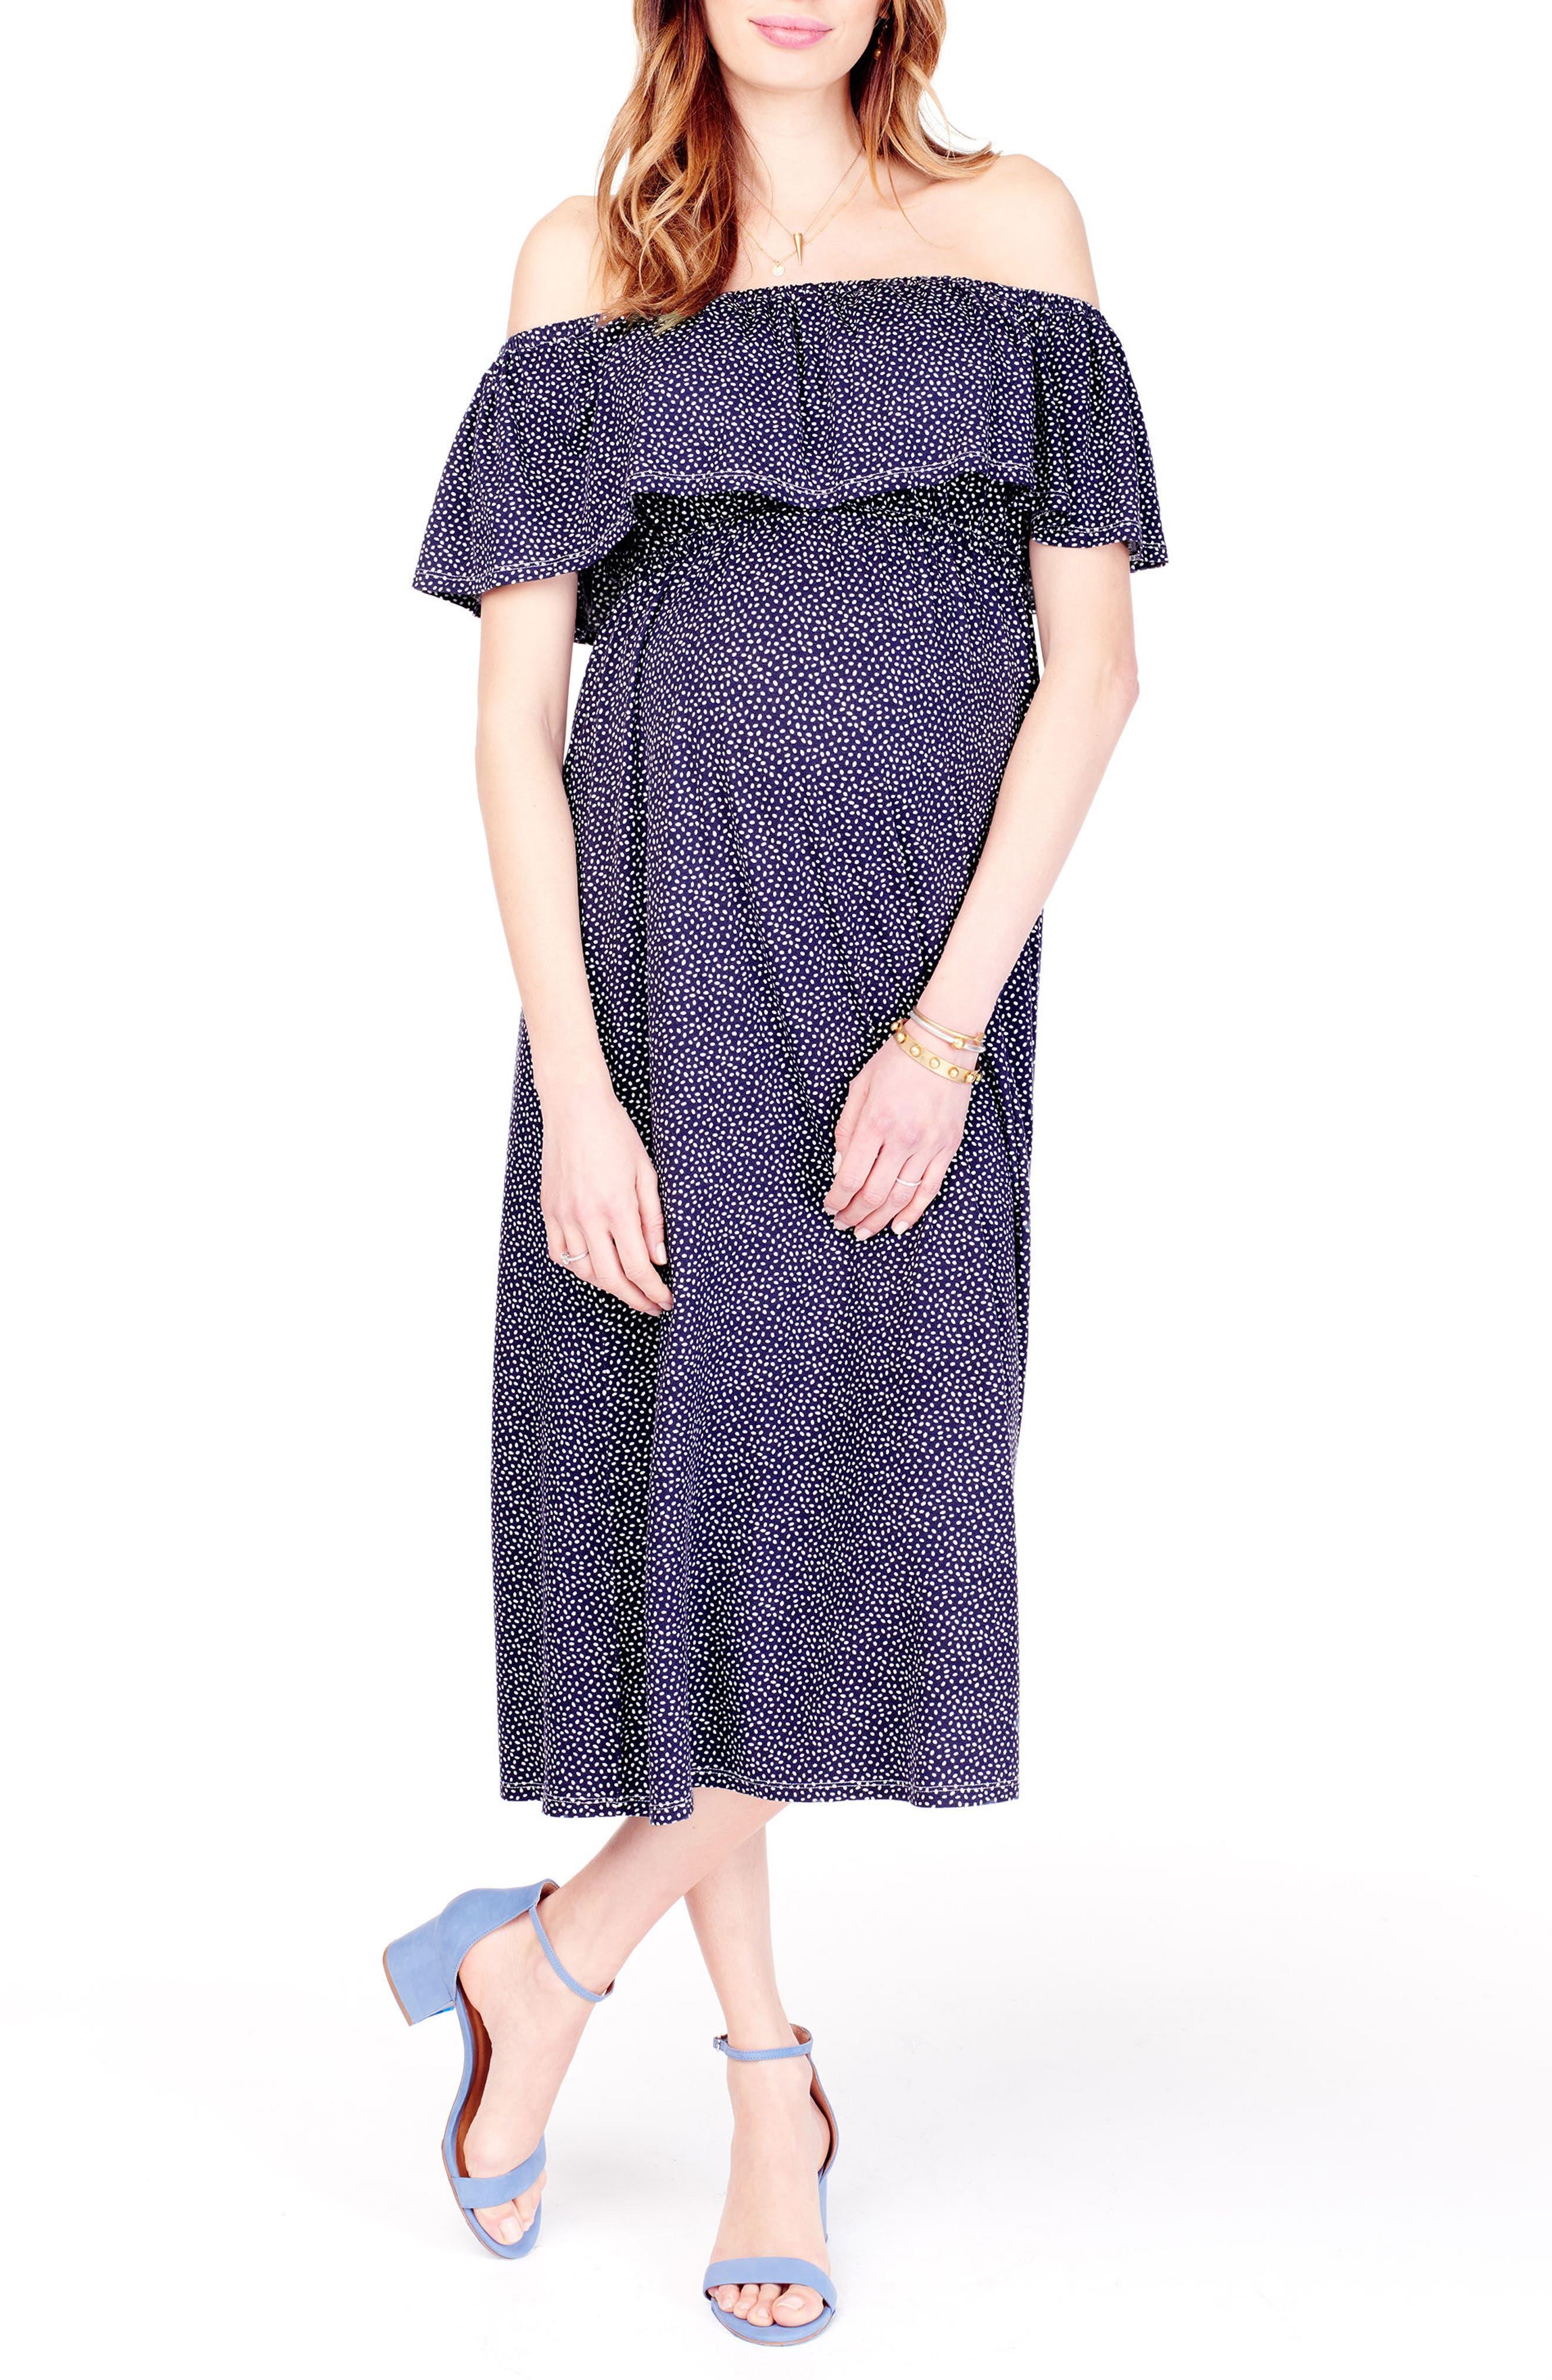 Off the Shoulder Maternity Midi Dress,                             Main thumbnail 1, color,                             Navy Tossed Petal